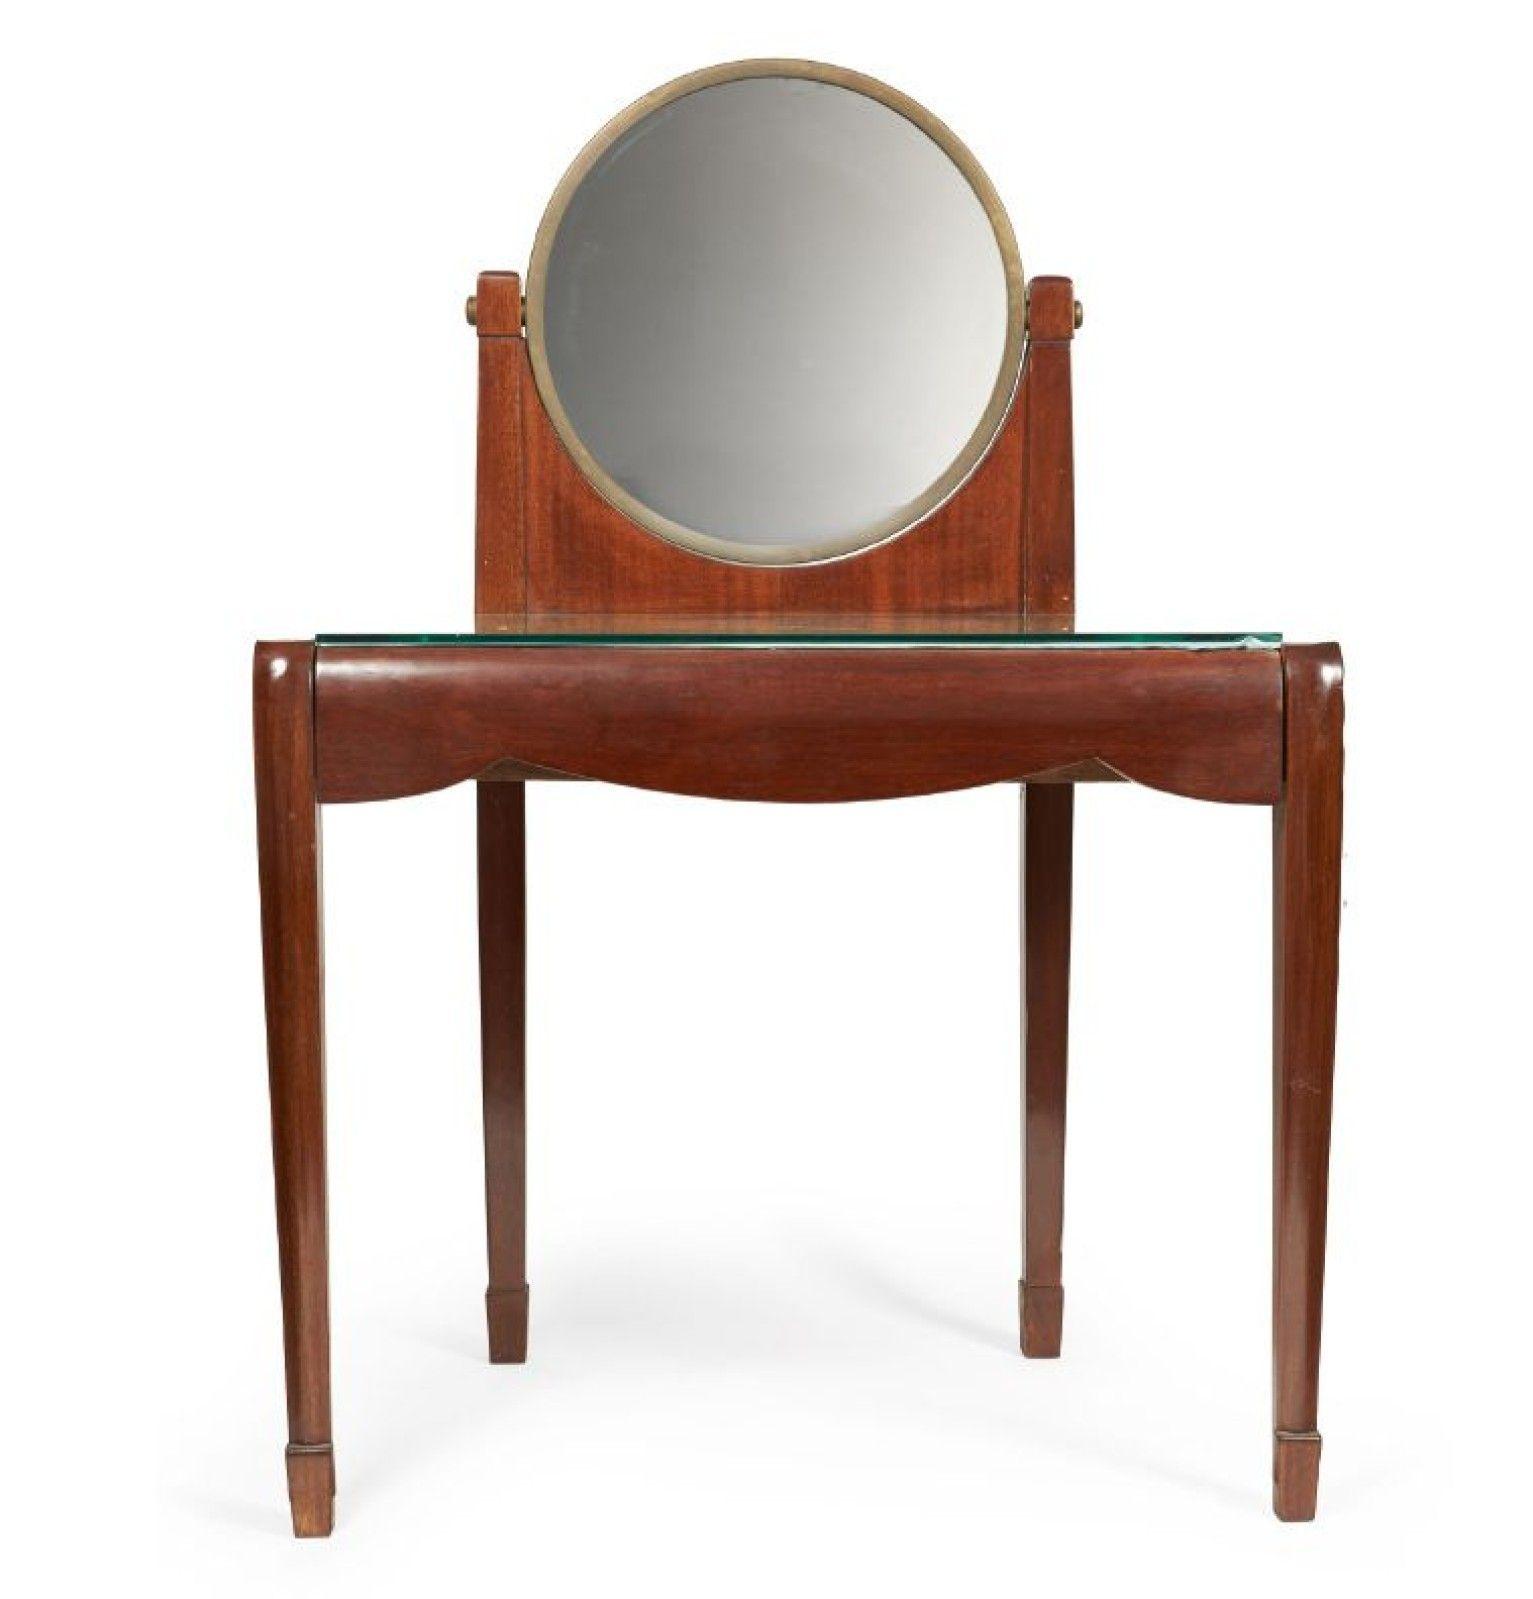 Andr Louis S E & Mare Vanity Model No 541